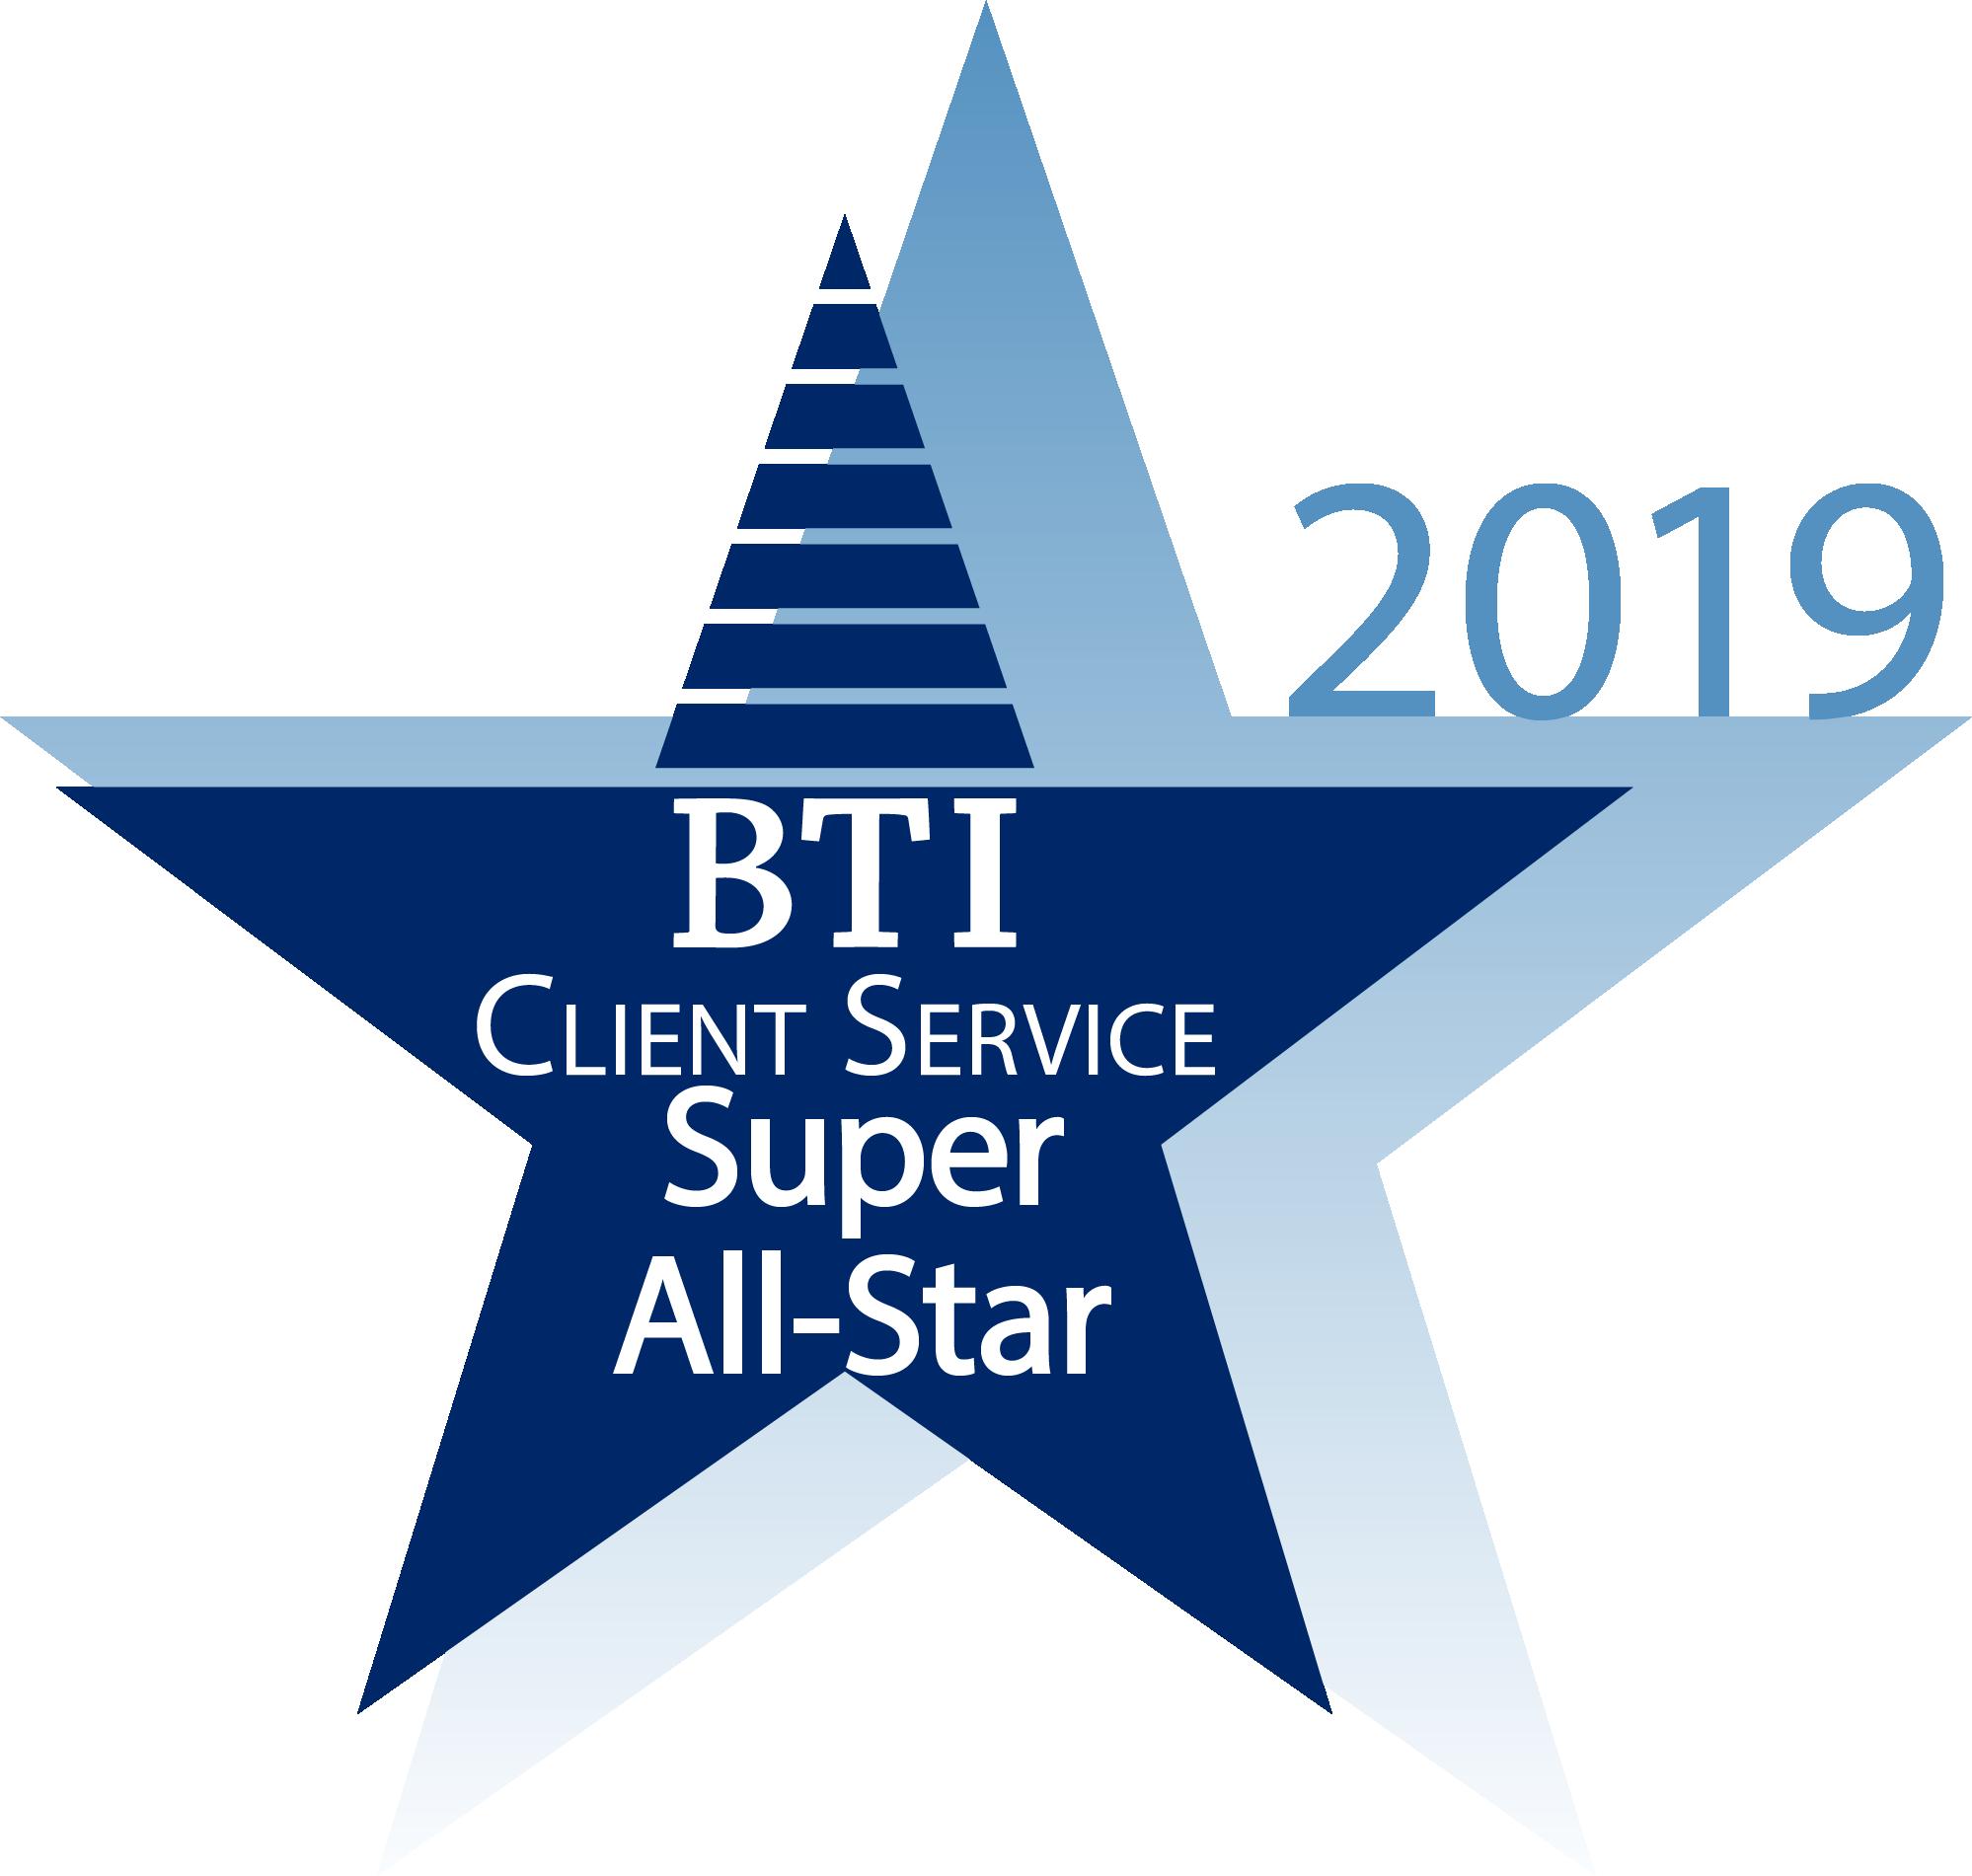 BTI_Client_Service_Super All-Star_2019.png